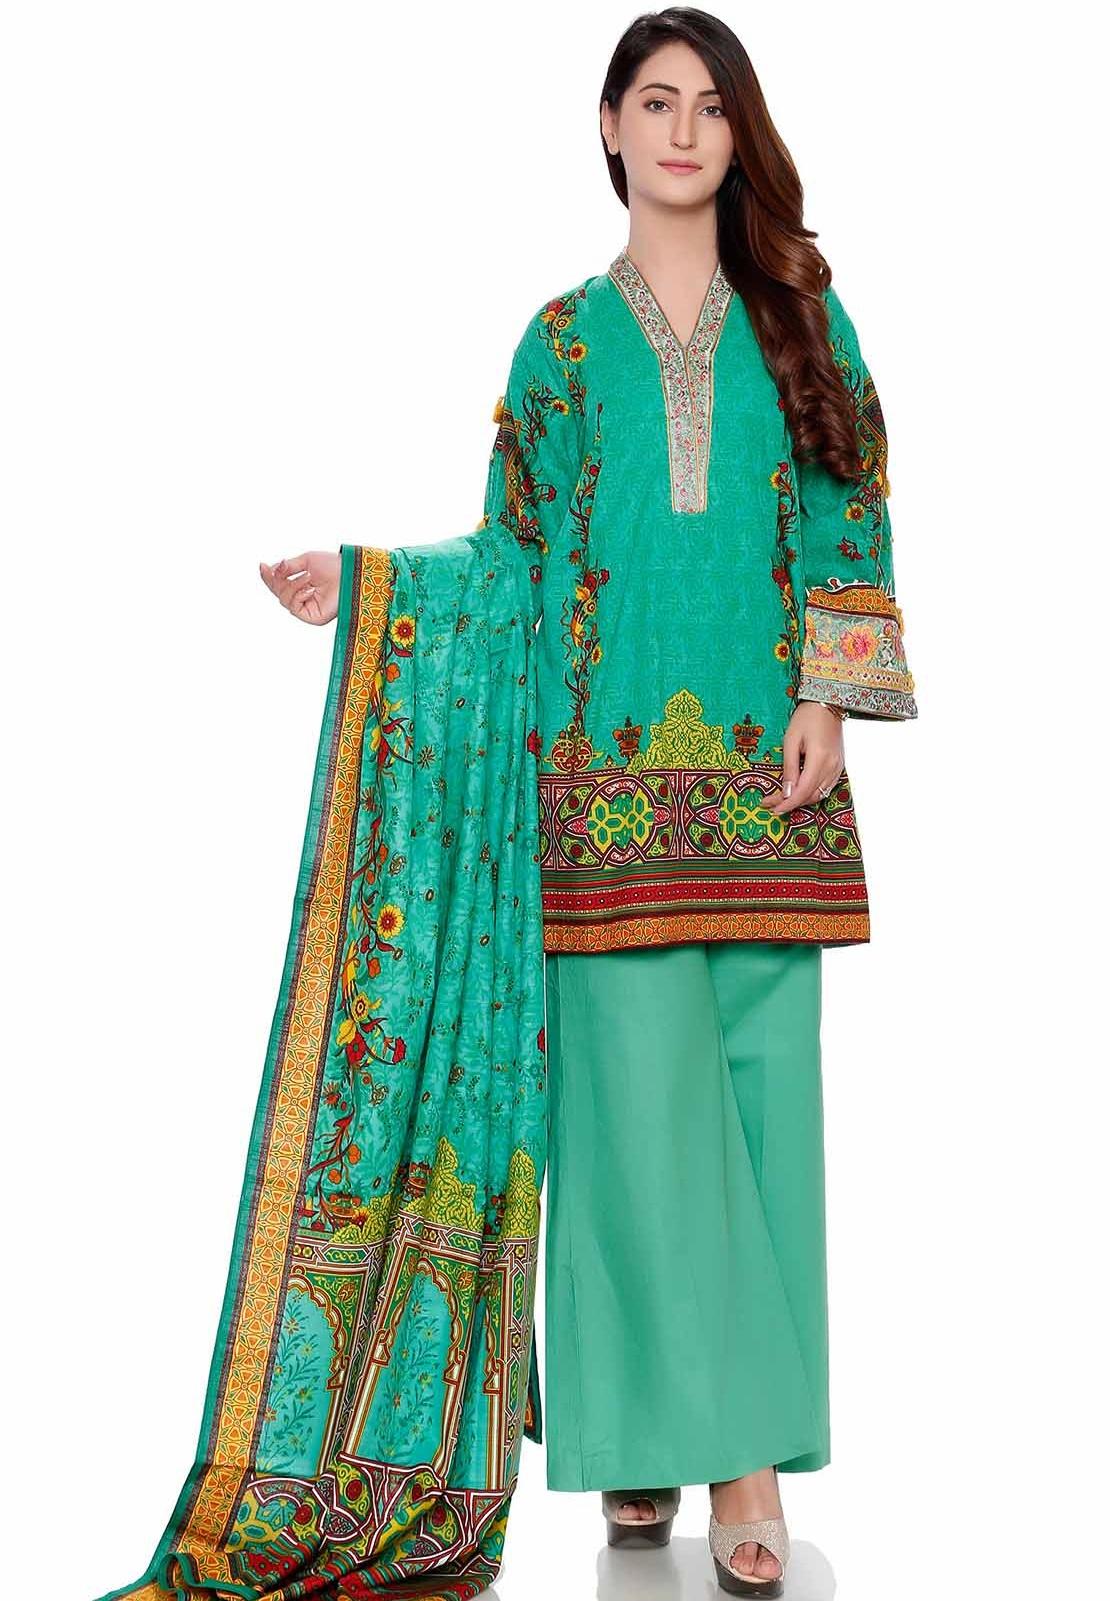 Warda sea-green stitched khaddar winter suit